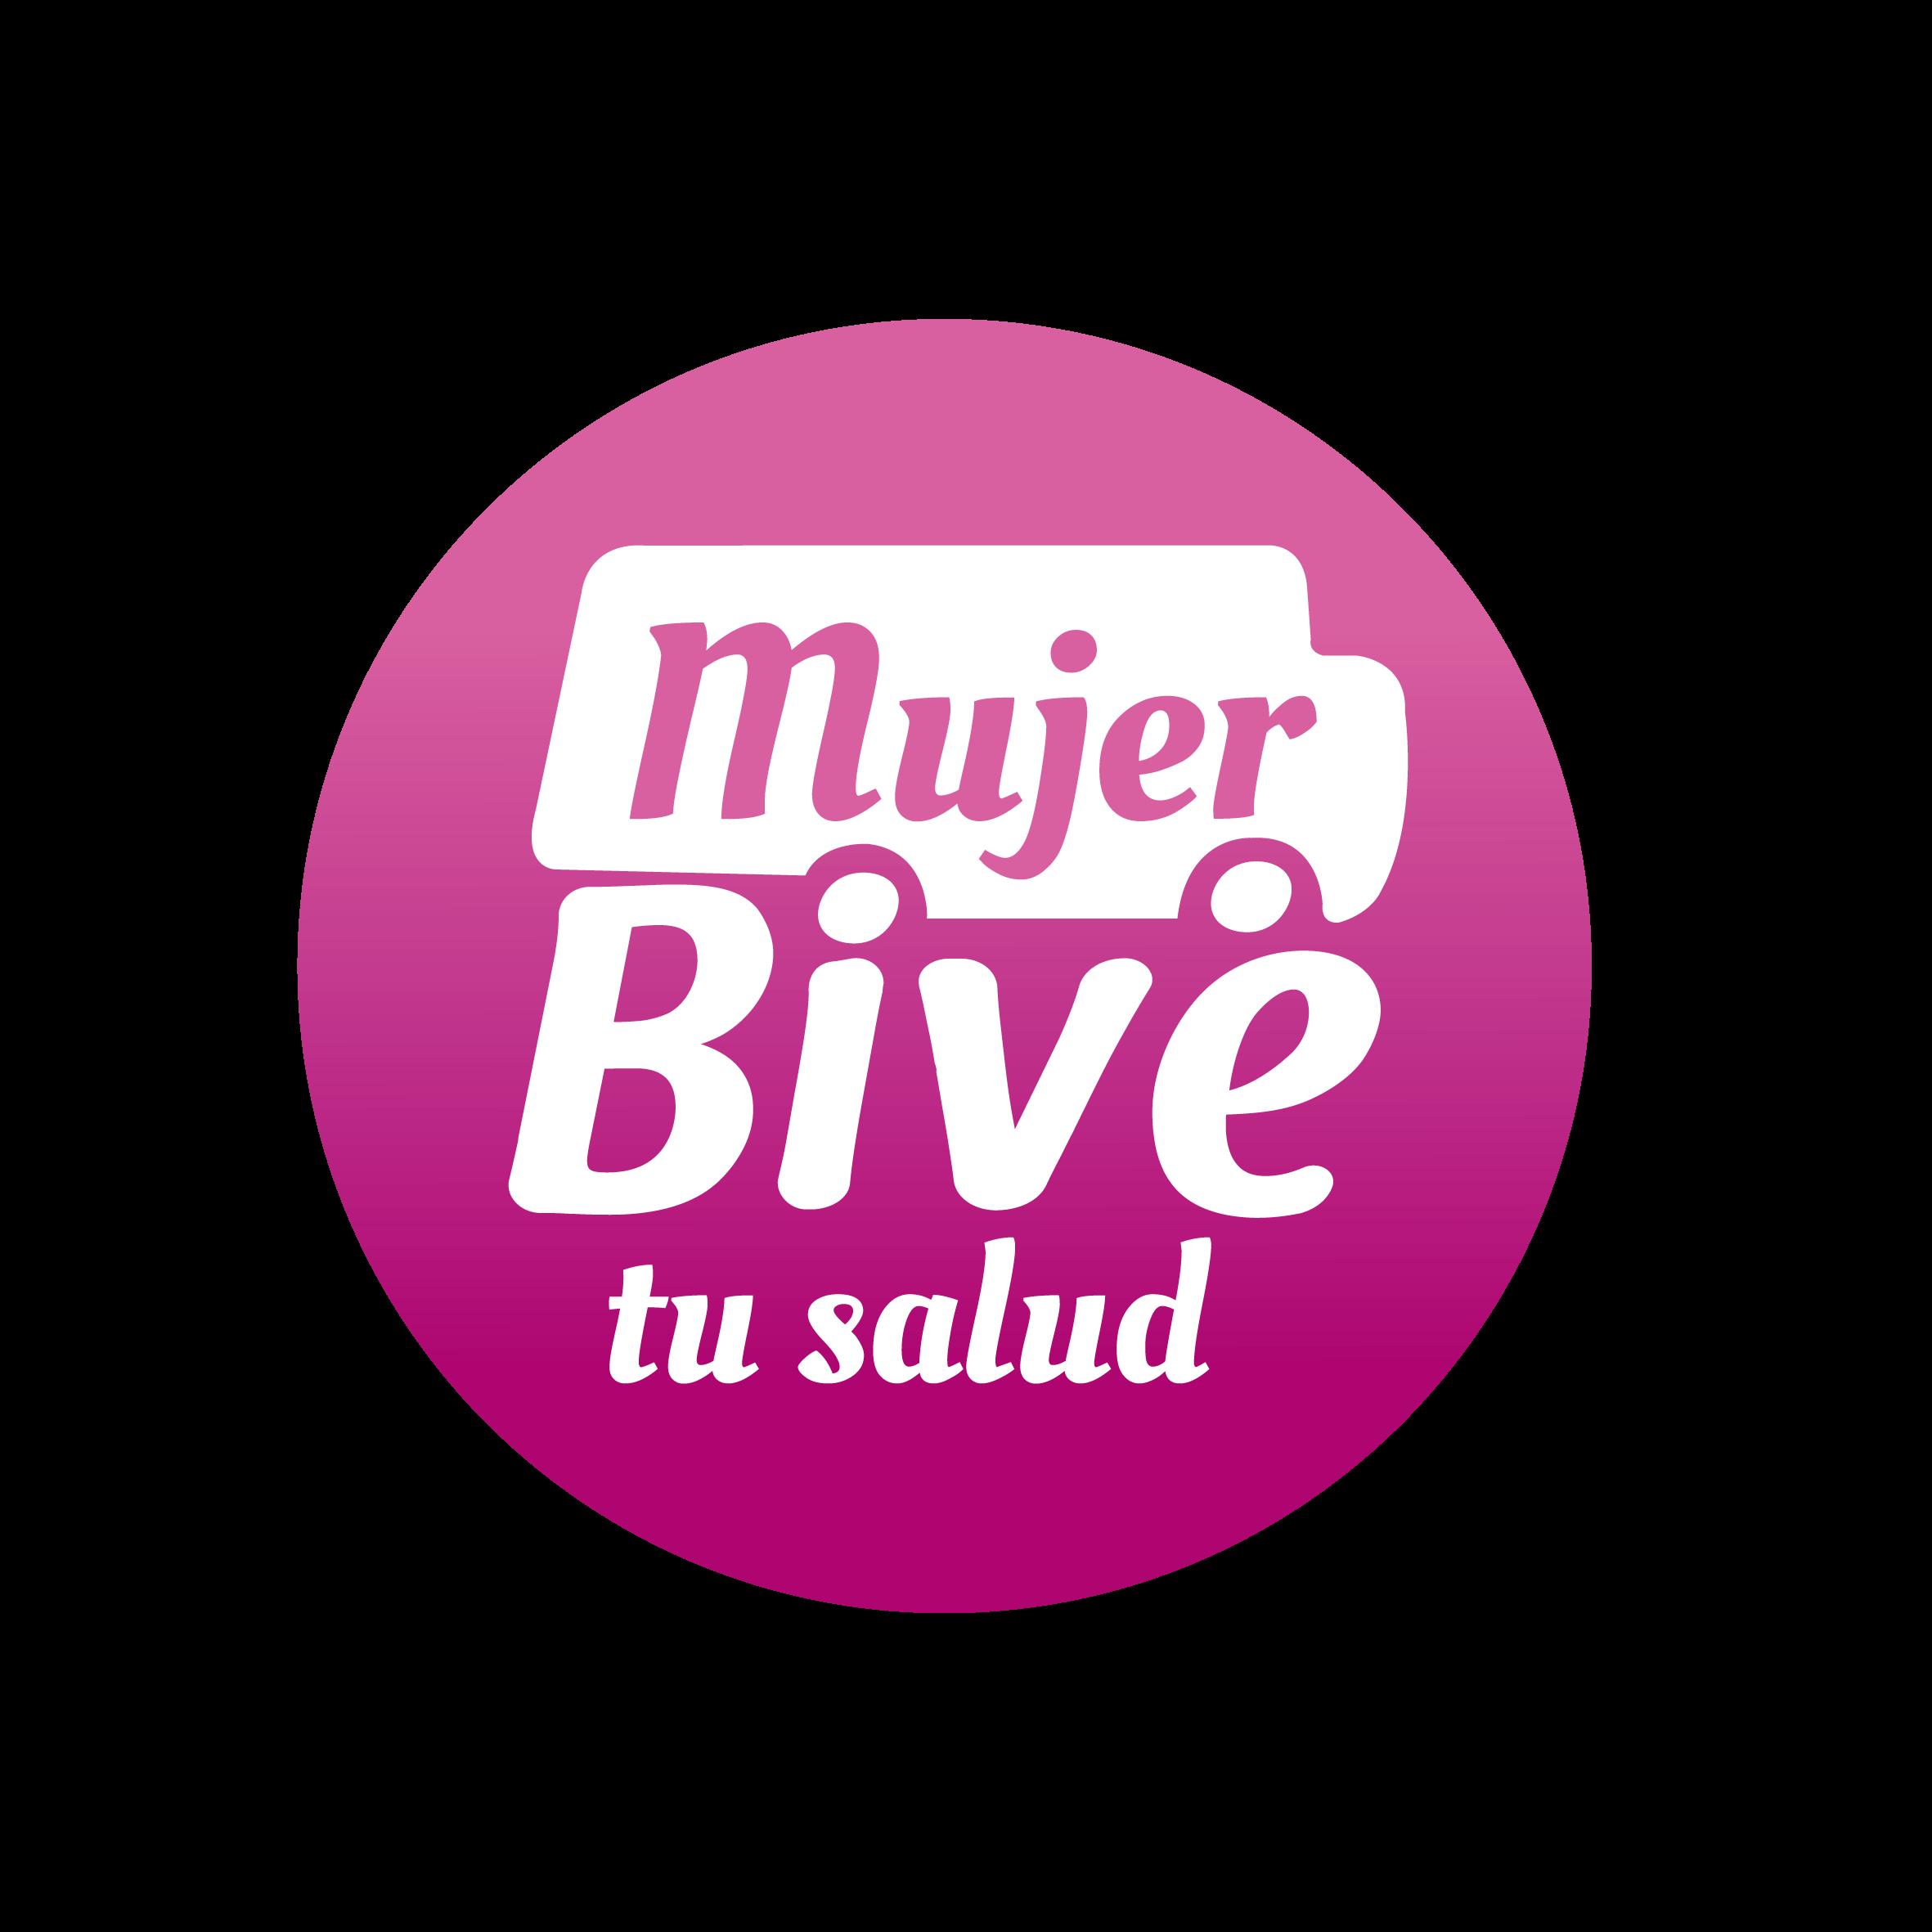 Logo Mujer Bive tu salud